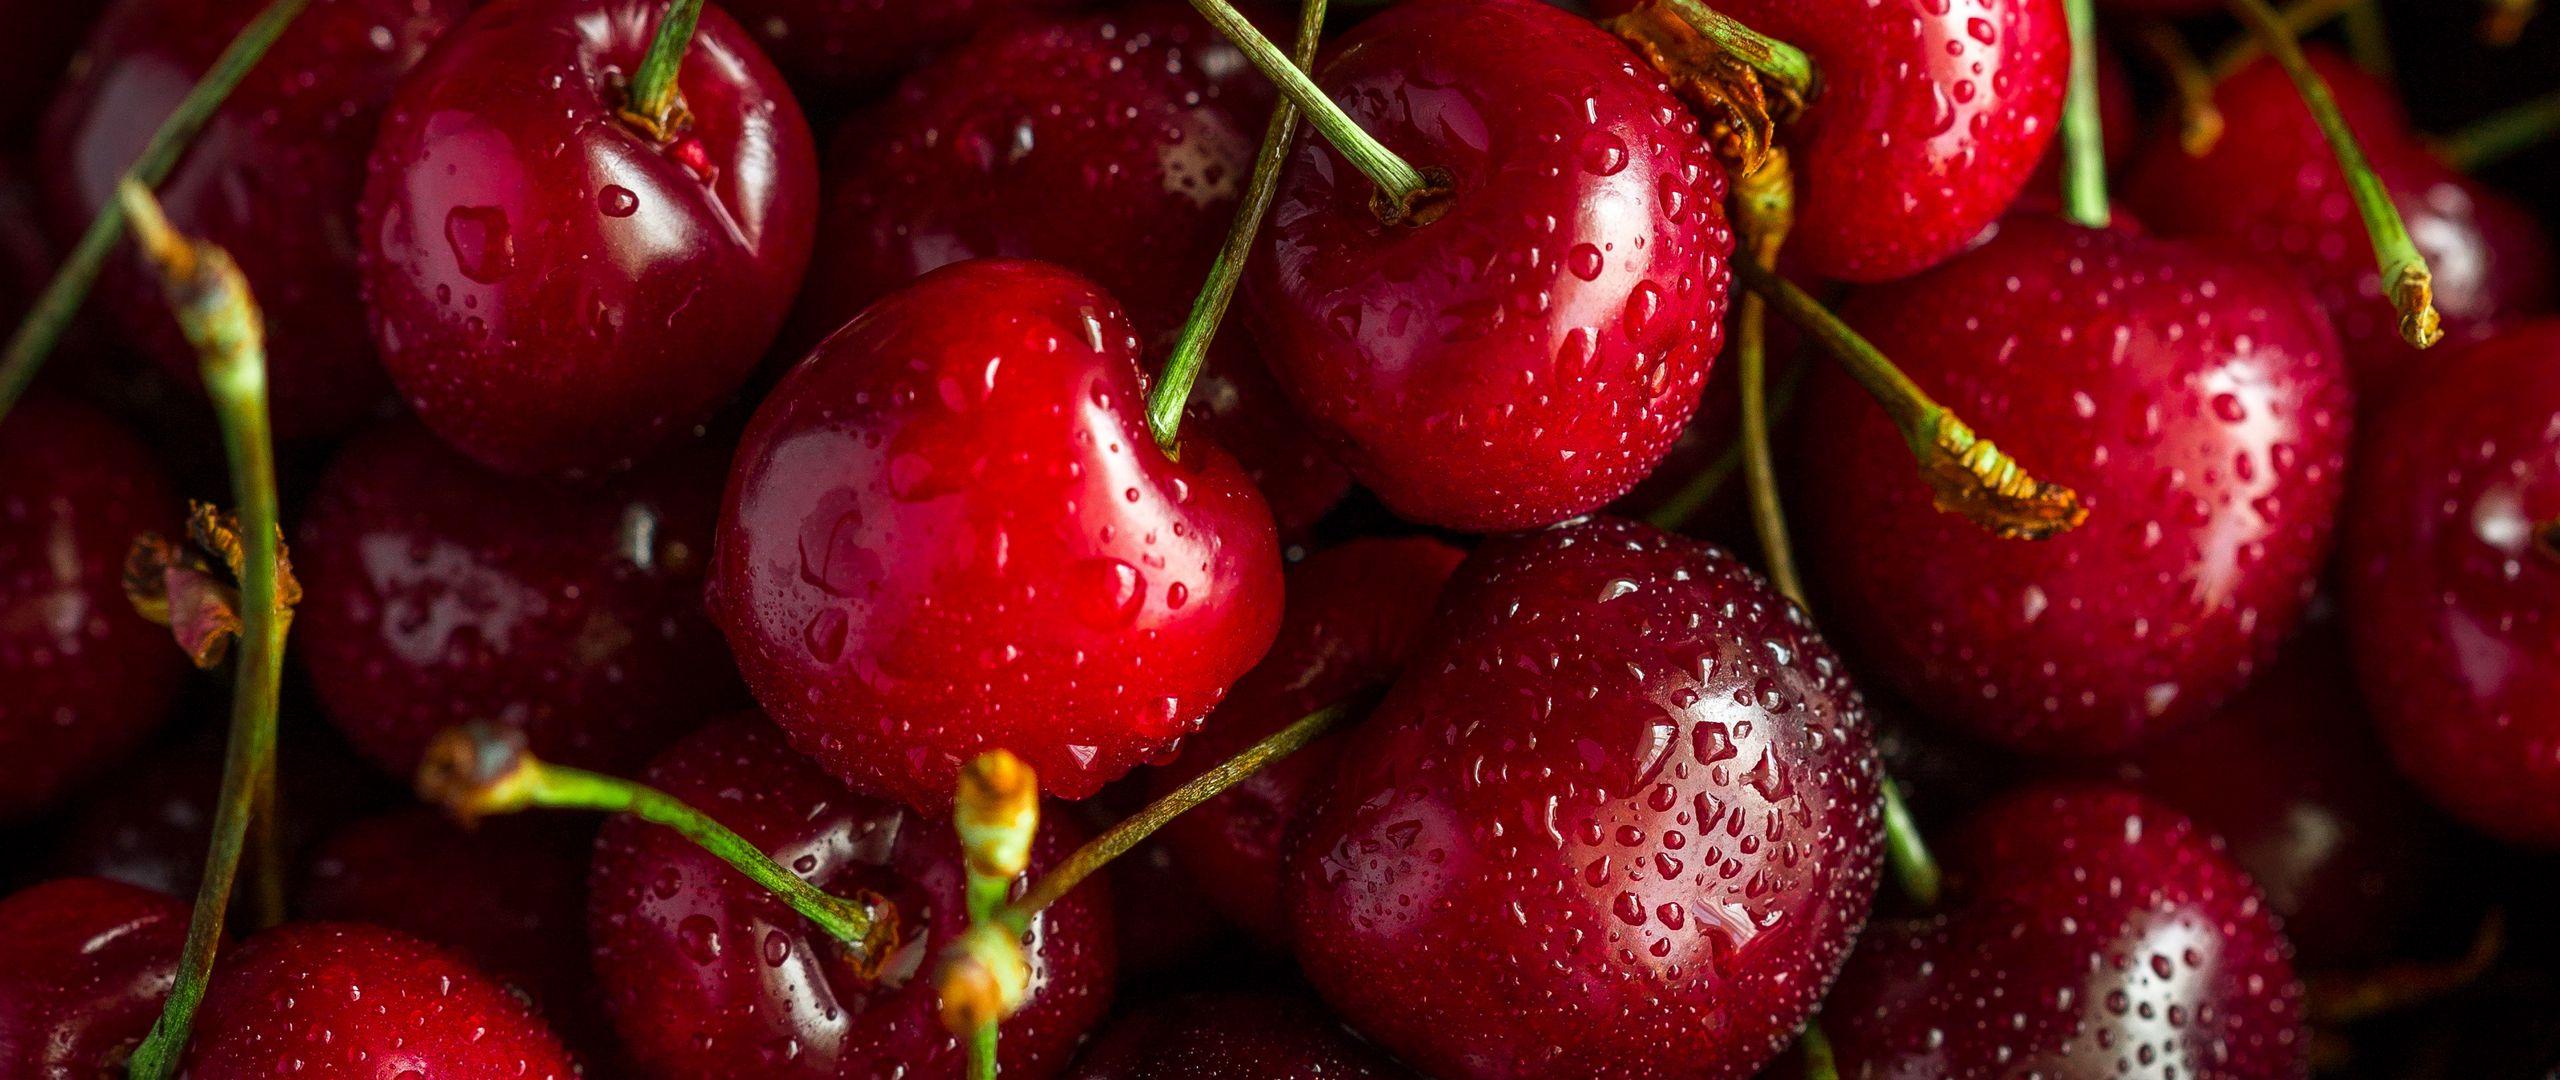 2560x1080 Wallpaper cherry, ripe, wet, berries, harvest, red, drops